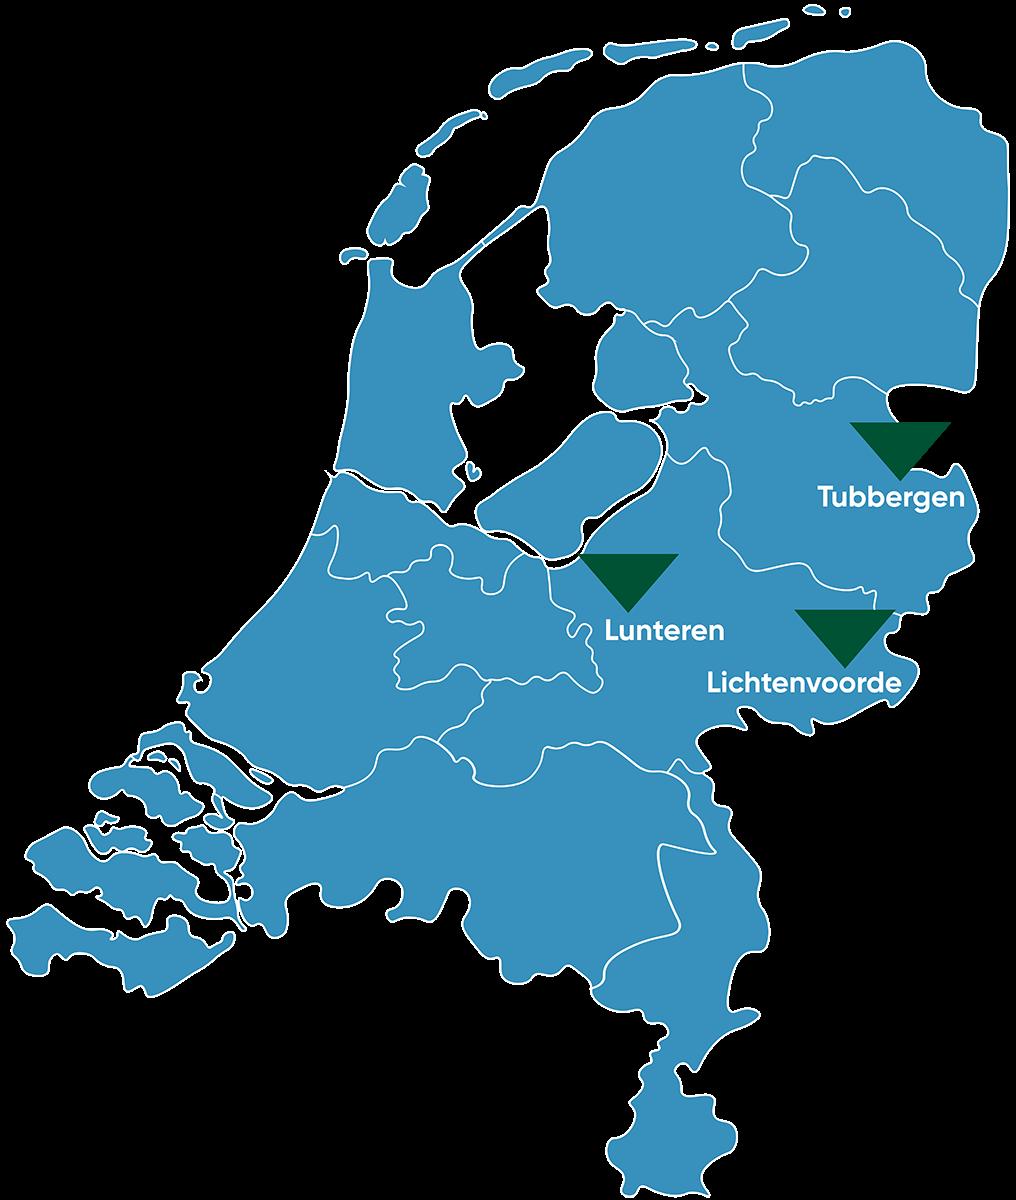 Kaart_Nederland_Lunteren_Transparant